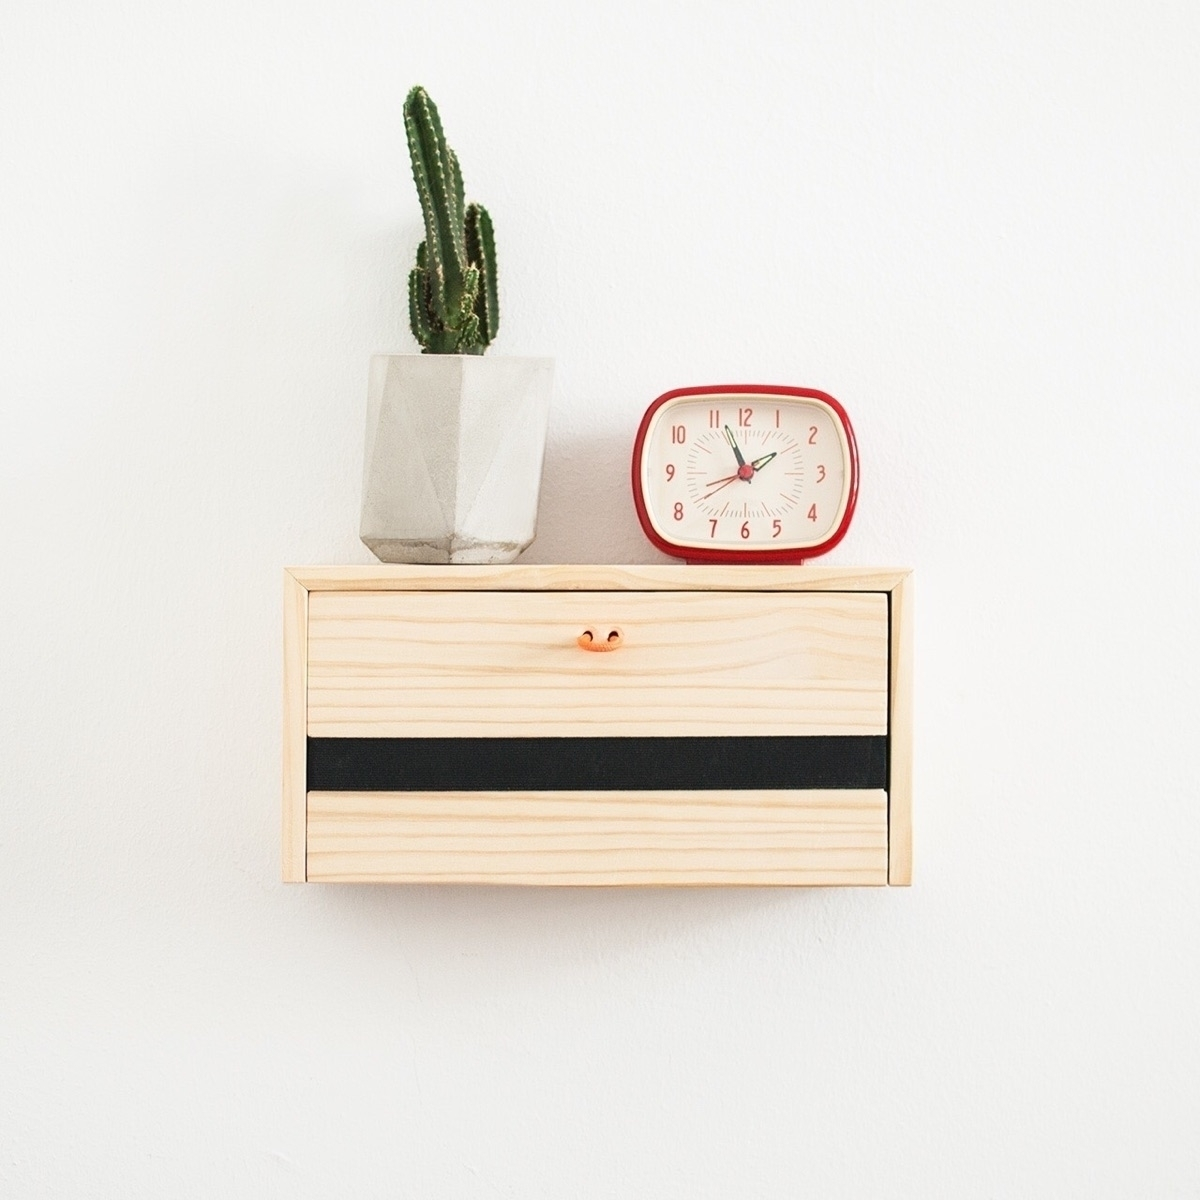 Wall floating shelf designed co - oitenta | ello